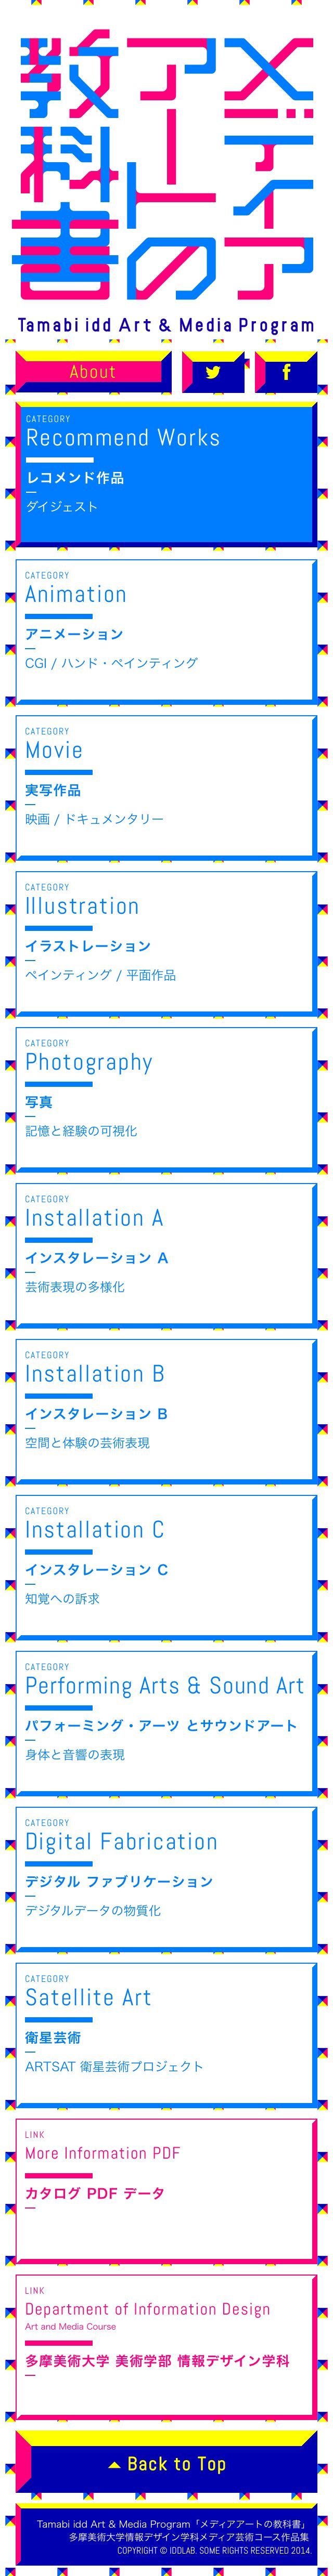 http://www.idd.tamabi.ac.jp/art/museum/art_and_media_program/